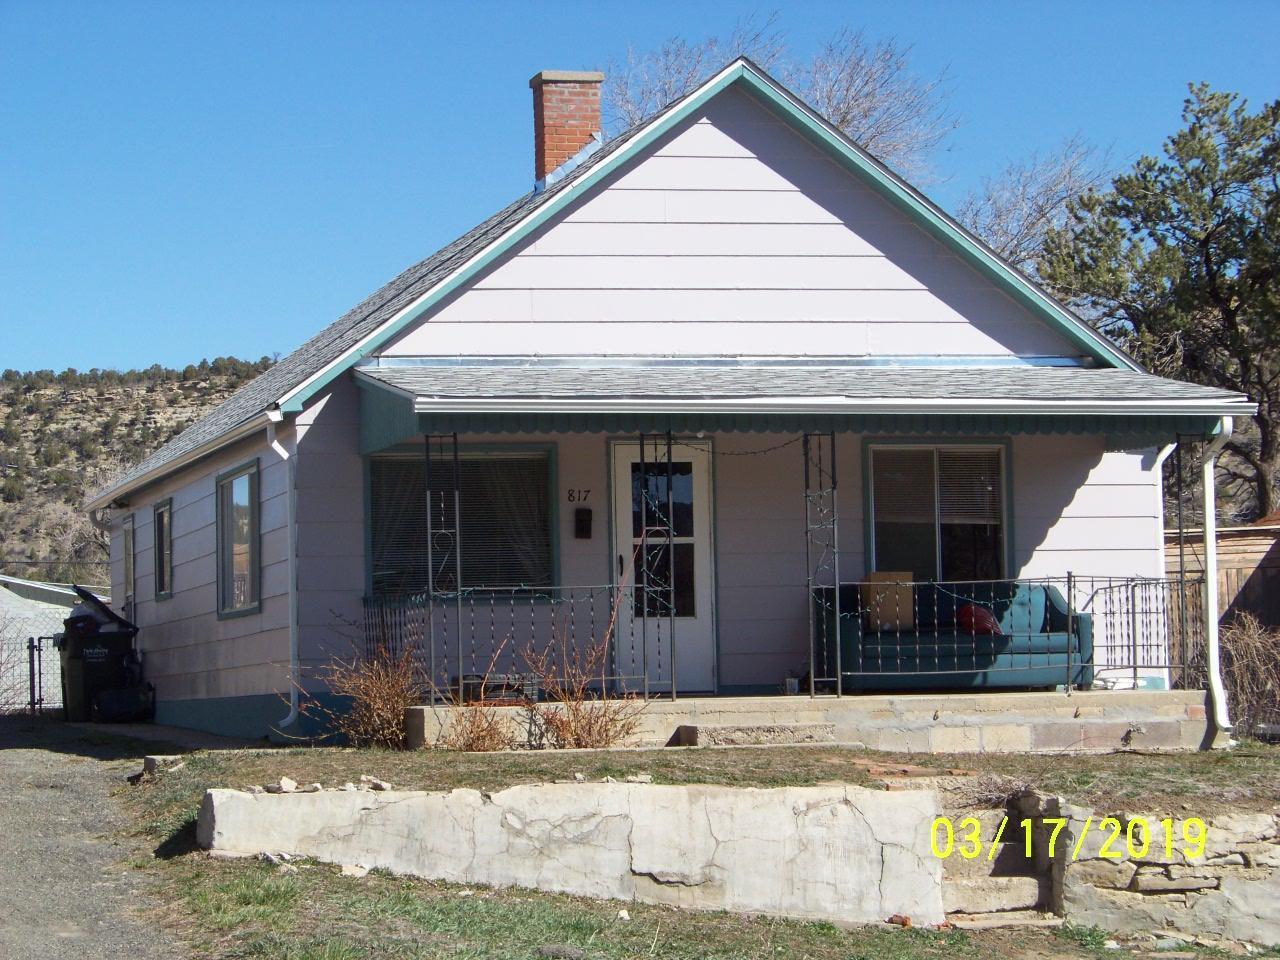 817 Kansas Ave - Photo 1